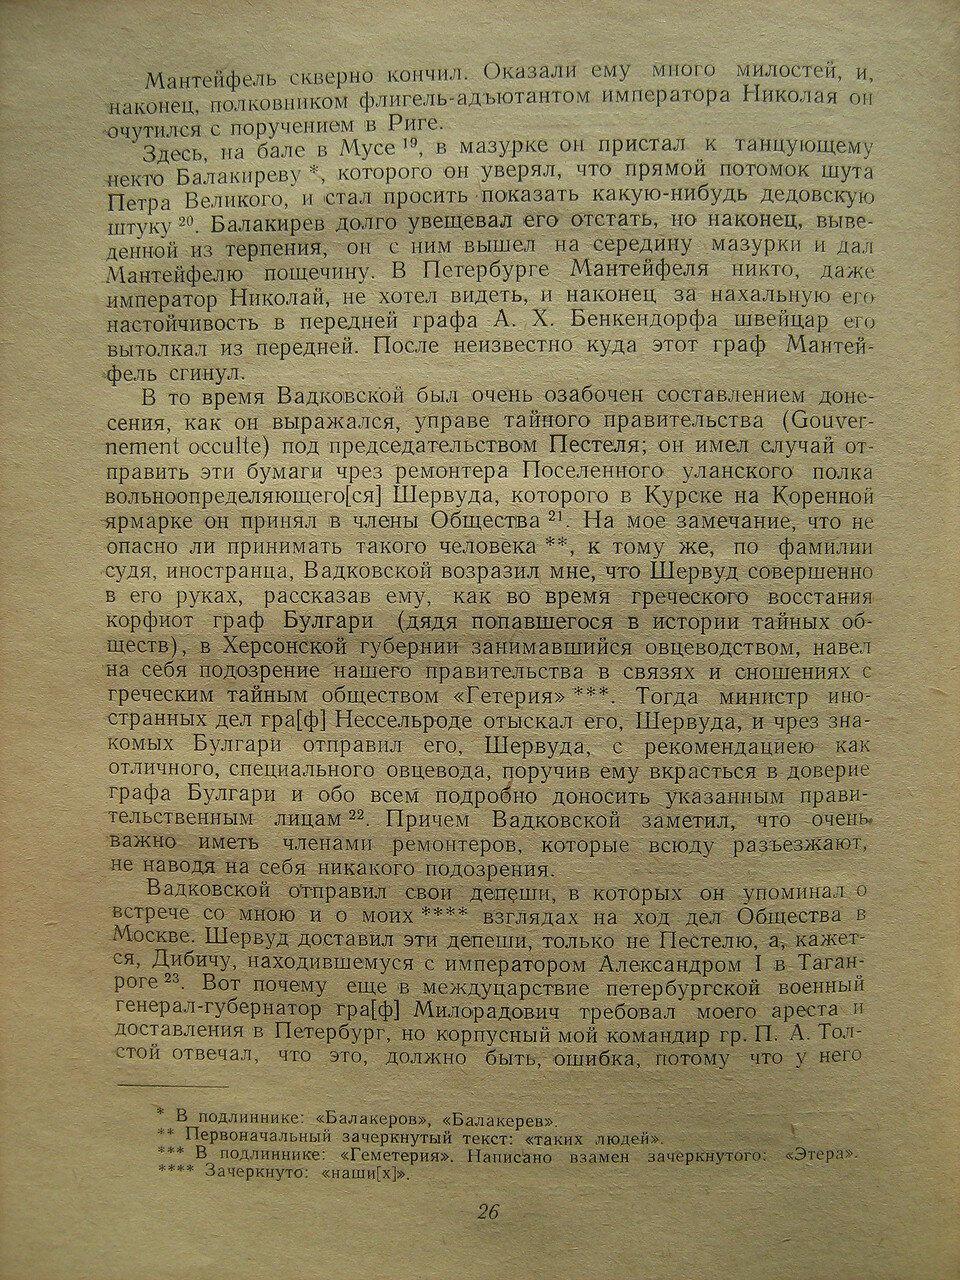 https://img-fotki.yandex.ru/get/510121/199368979.de/0_21f749_88256928_XXXL.jpg